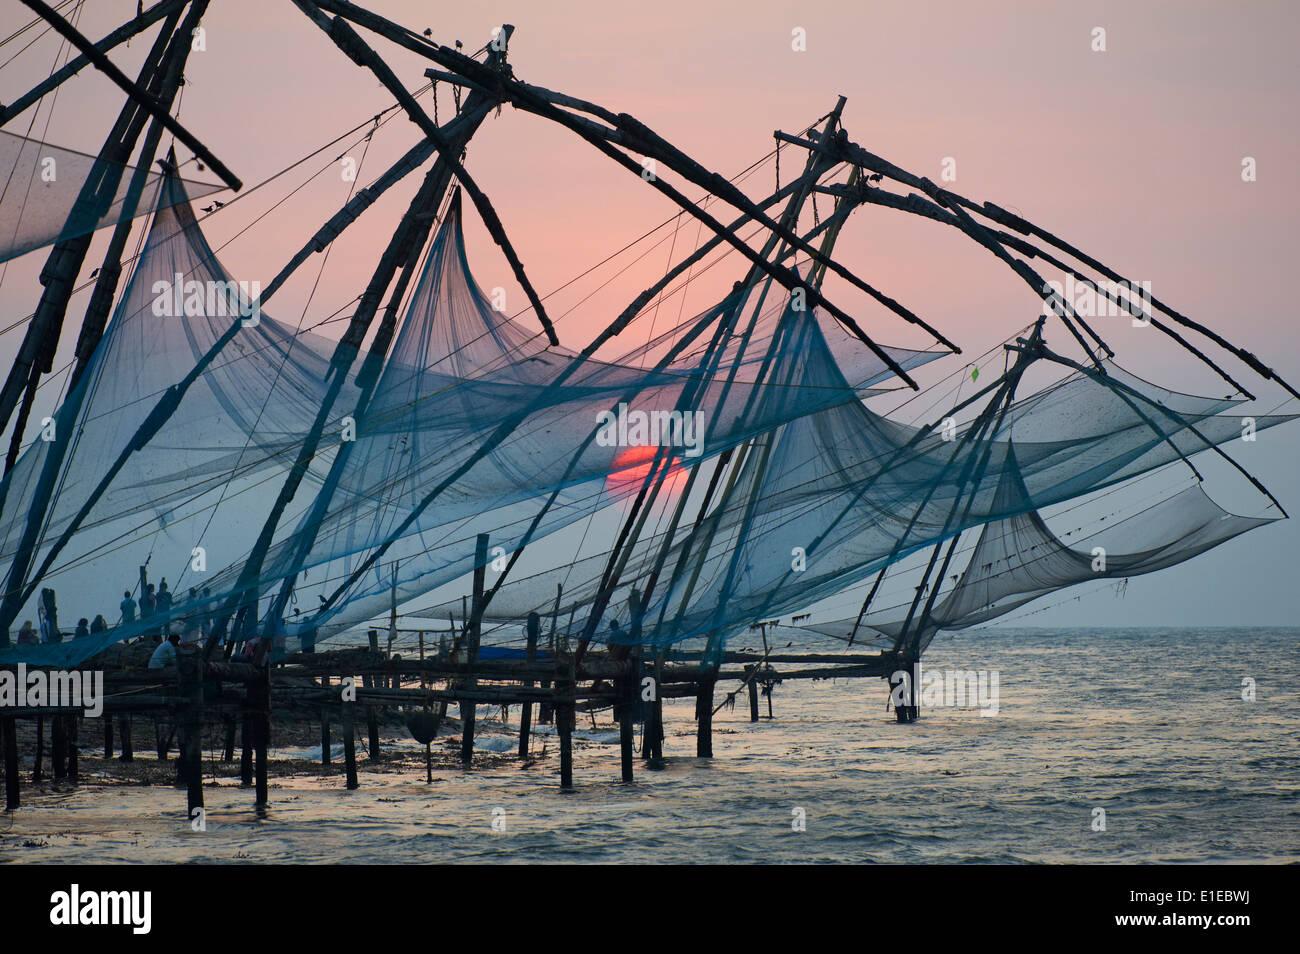 India Kerala State, Fort Cochin o Kochi, Cinese reti da pesca Immagini Stock